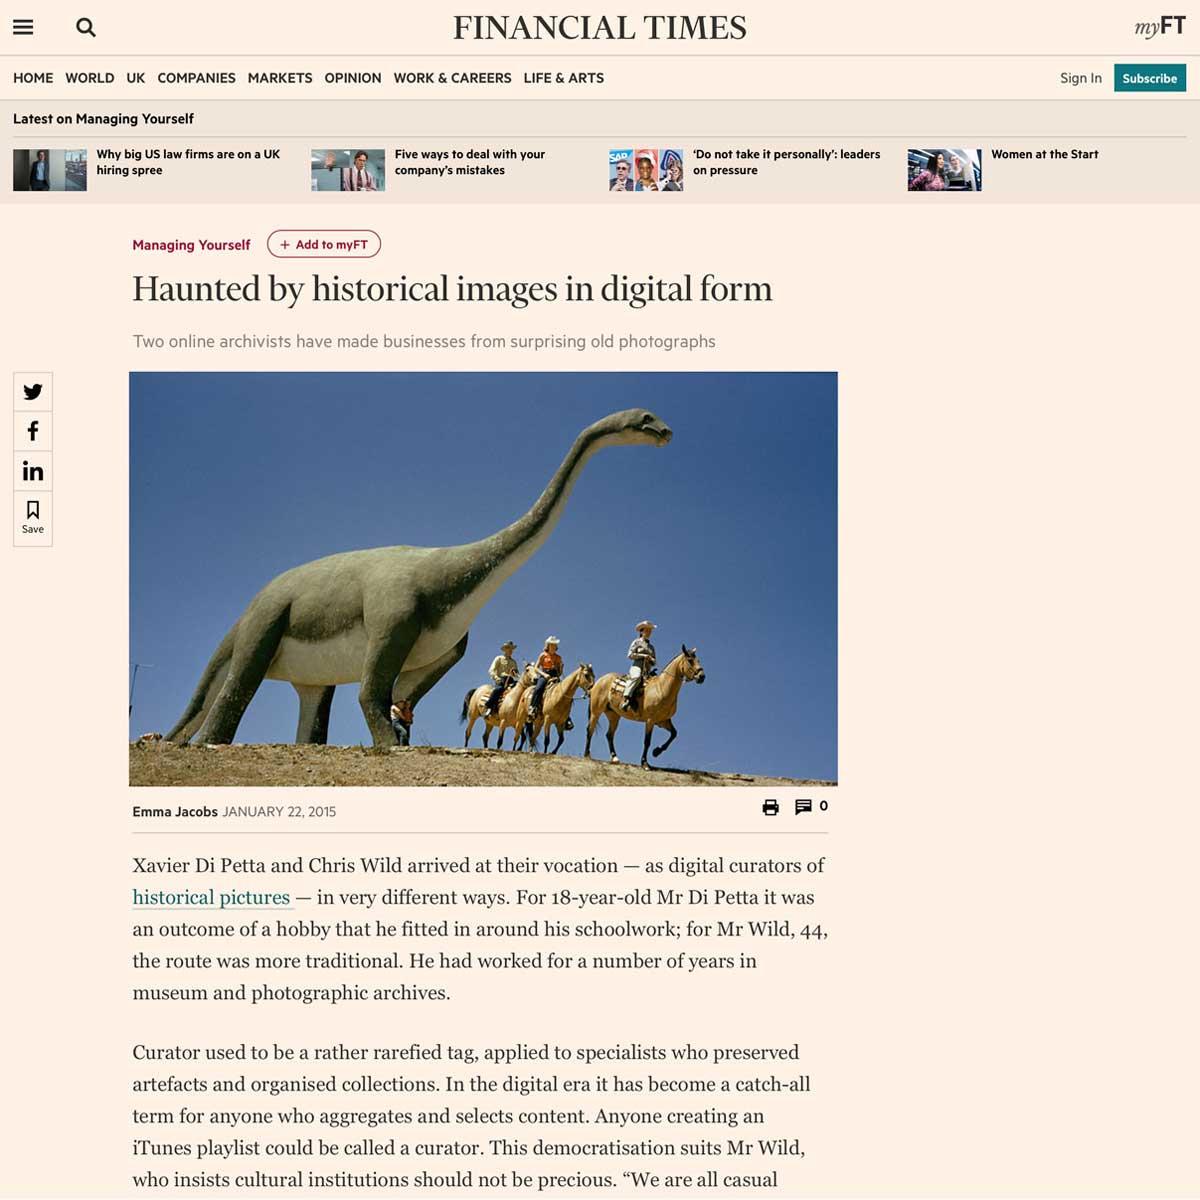 FINANCIAL TIMES - 2015